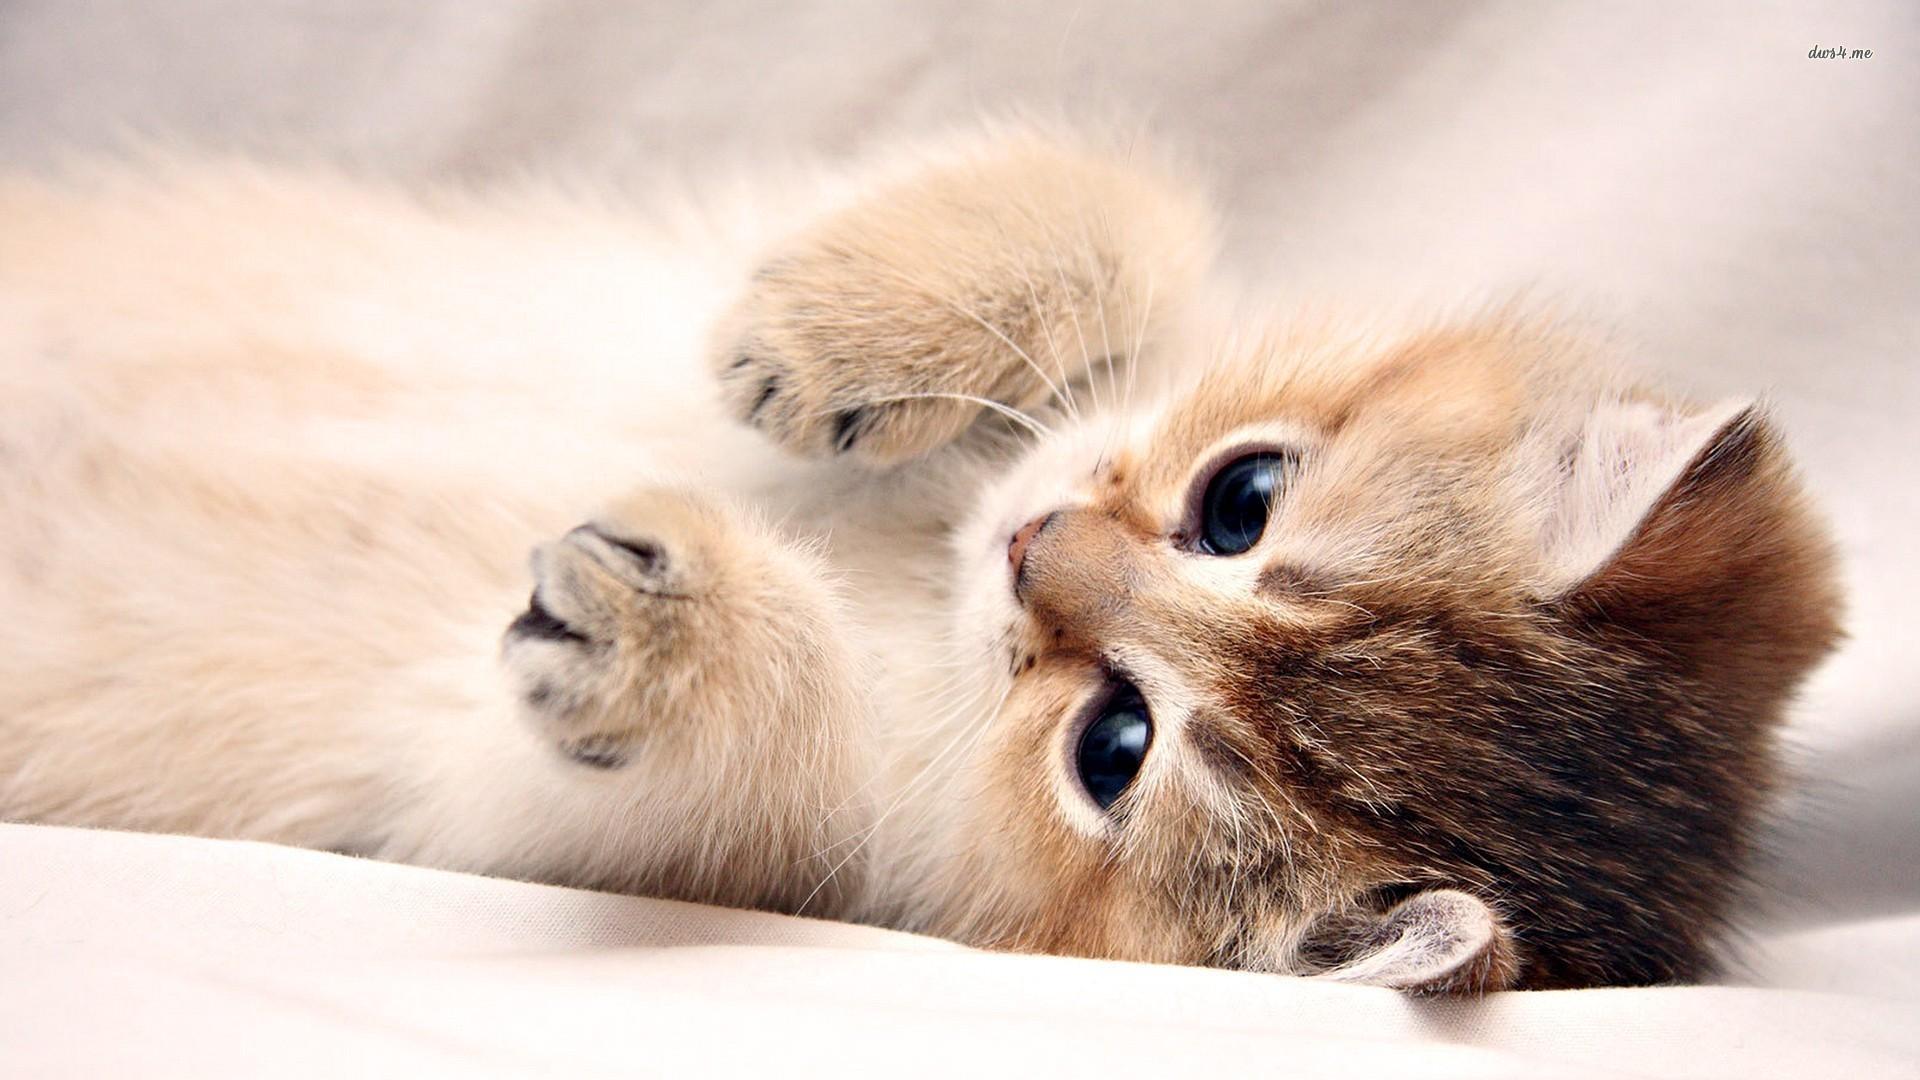 Kitten wallpaper 1280×800 Kitten wallpaper 1366×768 Kitten wallpaper .